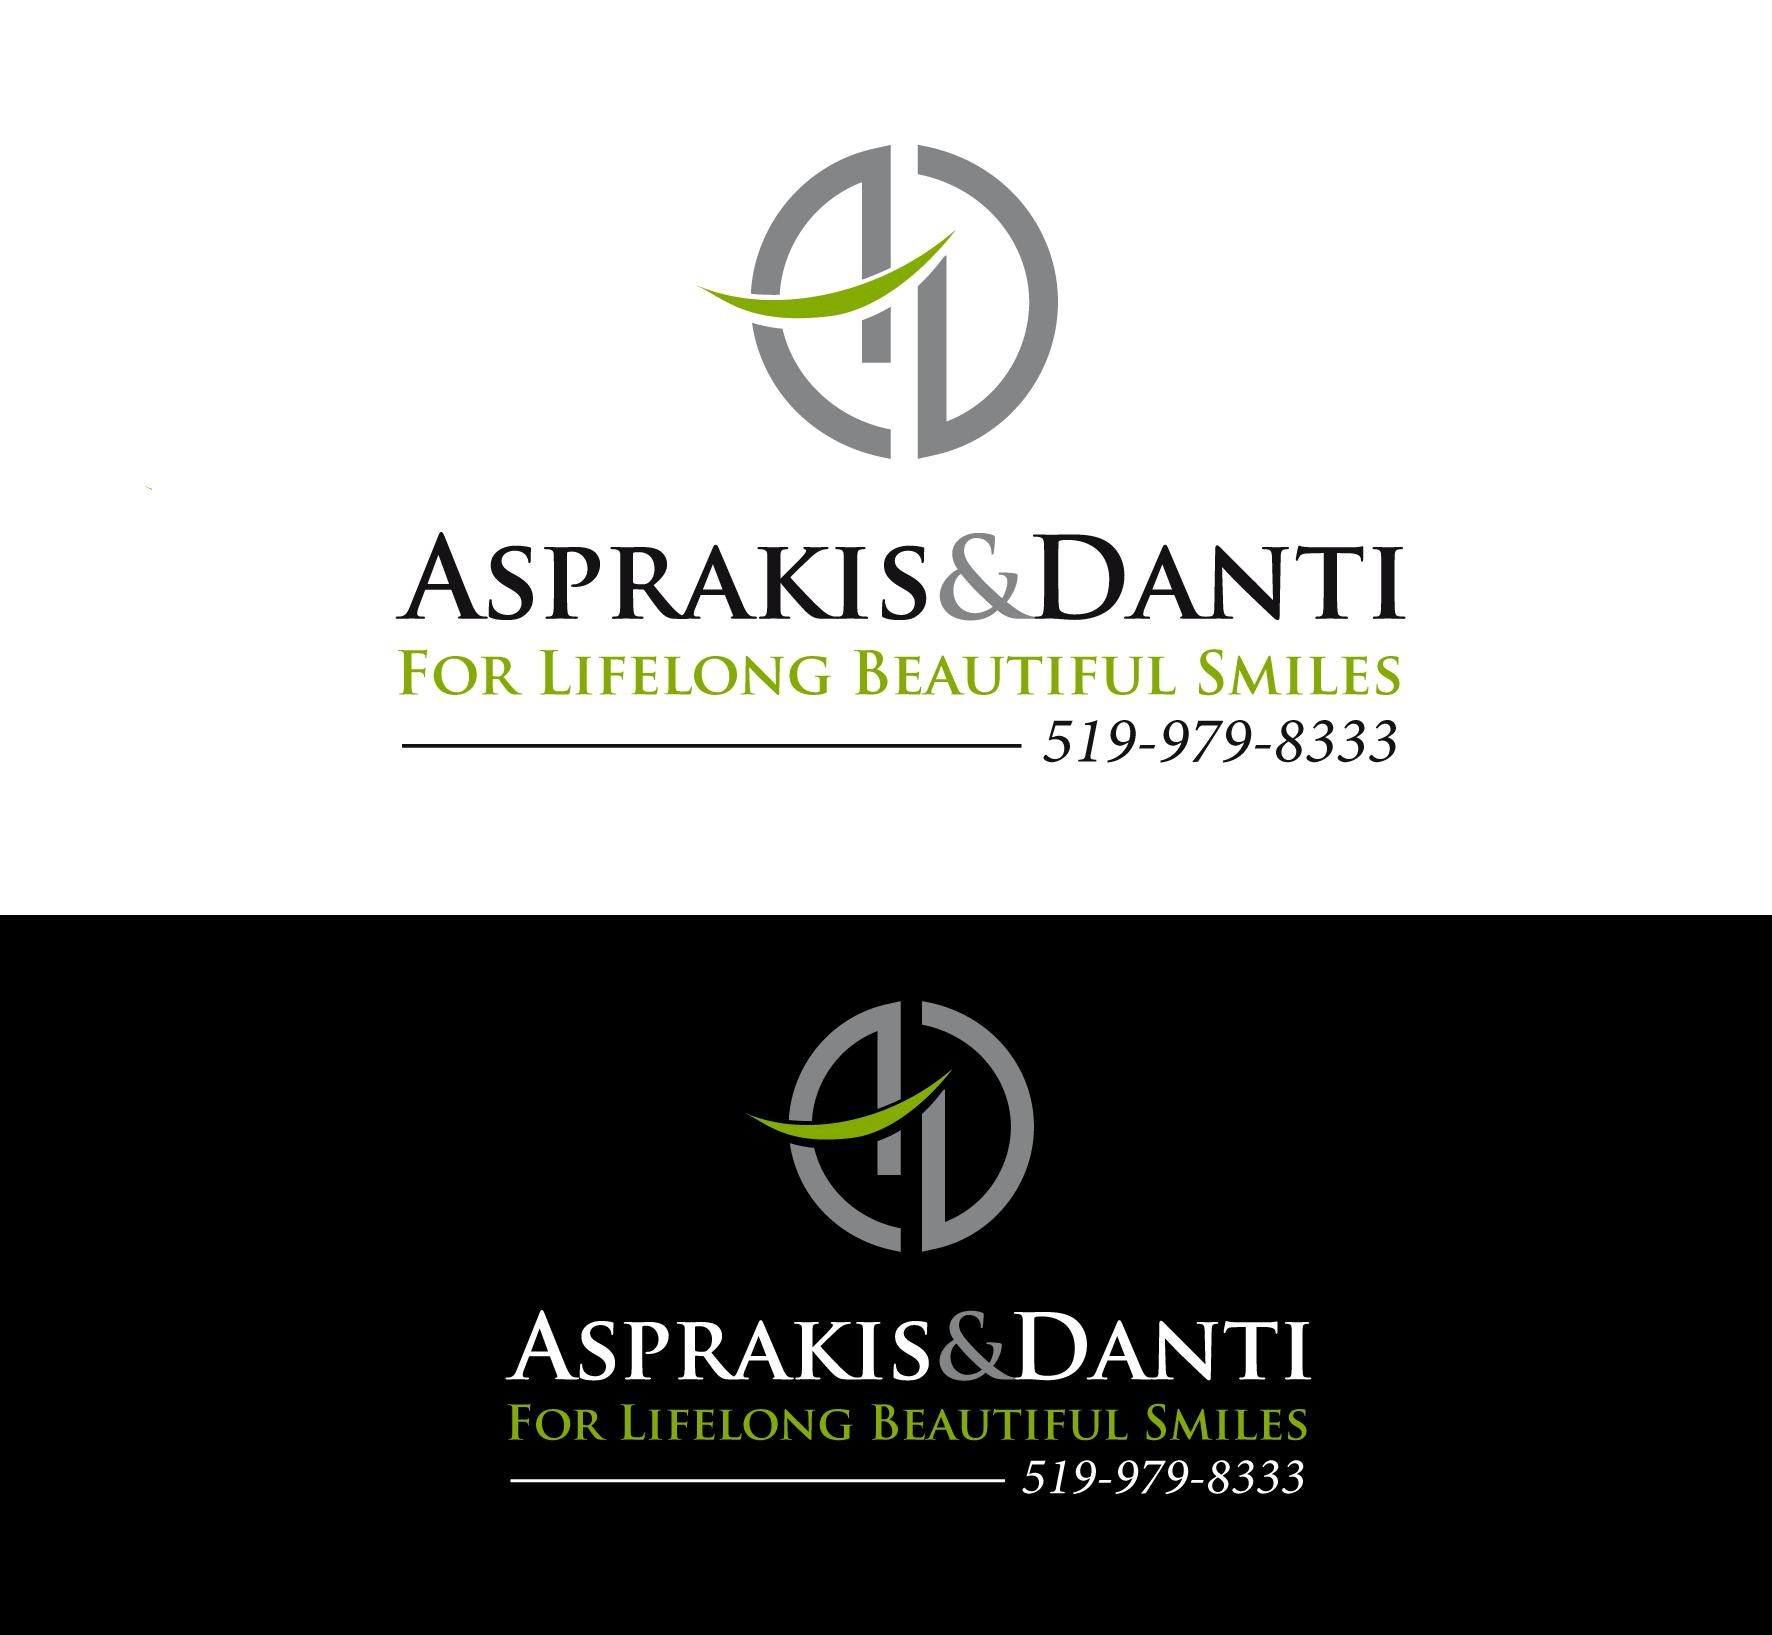 Logo Design by luna - Entry No. 139 in the Logo Design Contest Unique Logo Design Wanted for Asprakis and Danti.